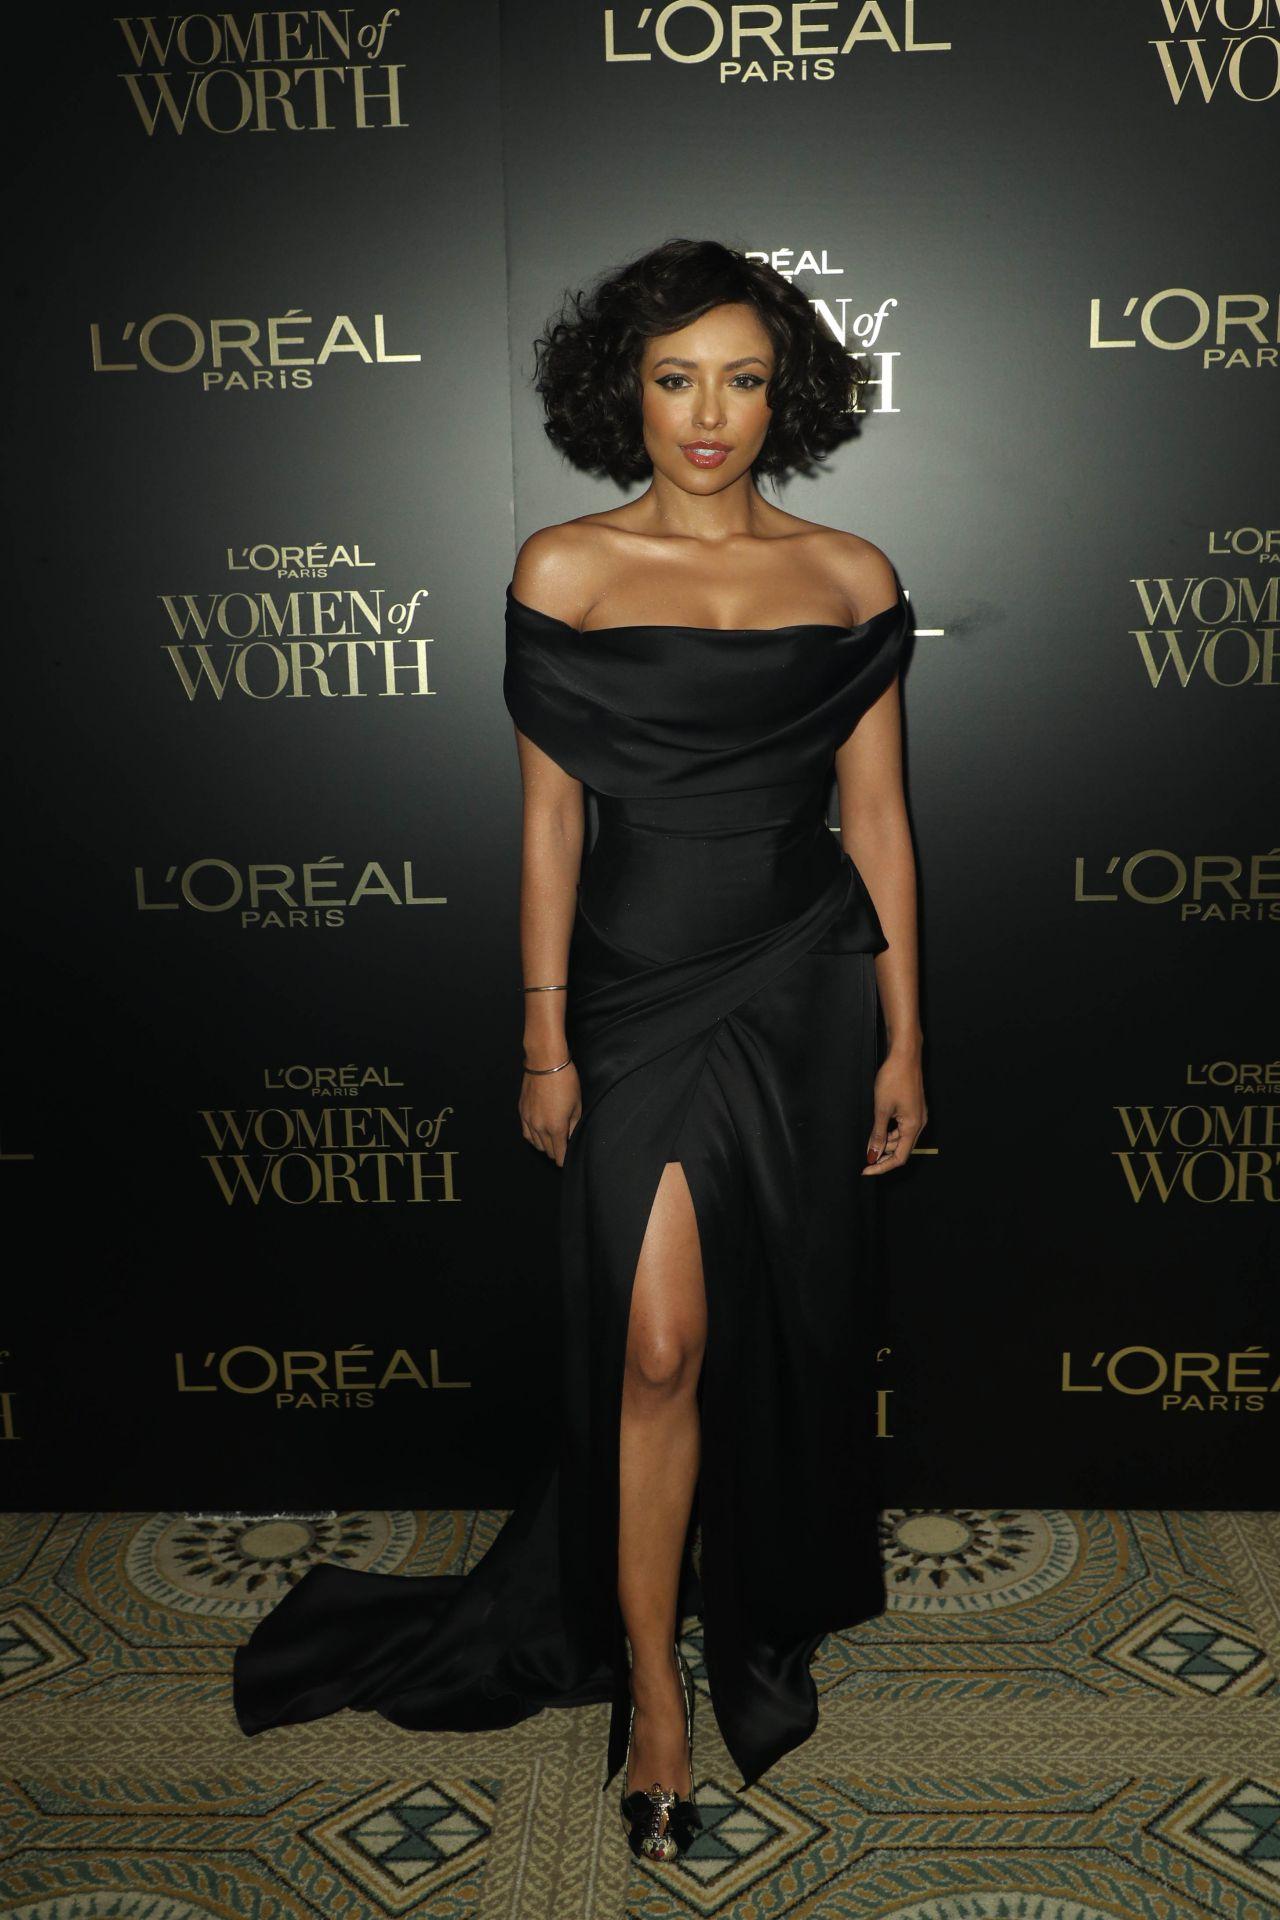 kat-graham-in-vivienne-westwood-2019-loreal-paris-women-of-worth-awards